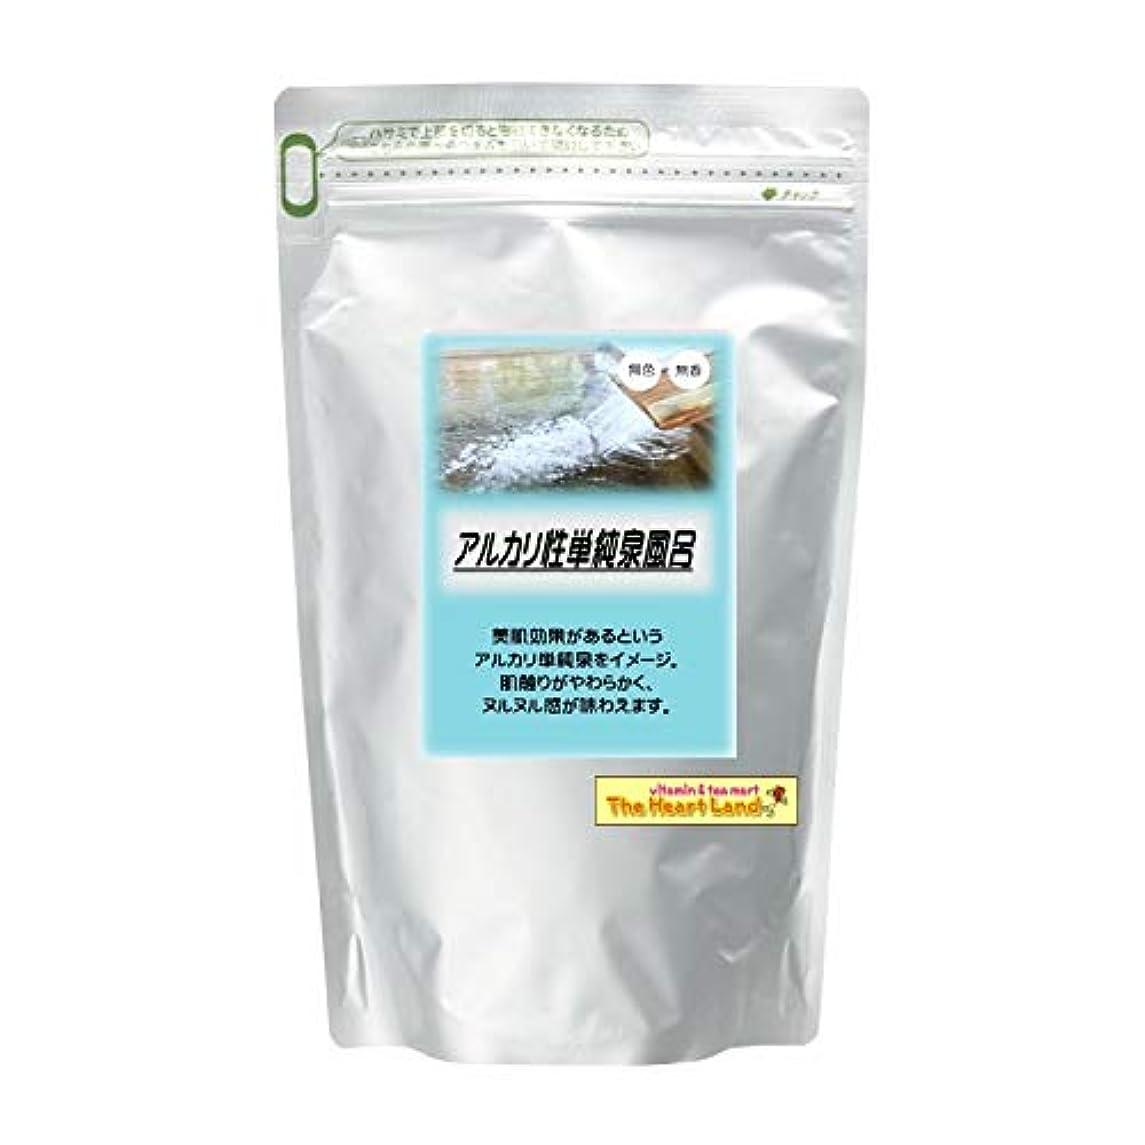 信号神経花輪アサヒ入浴剤 浴用入浴化粧品 アルカリ性単純泉風呂 2.5kg